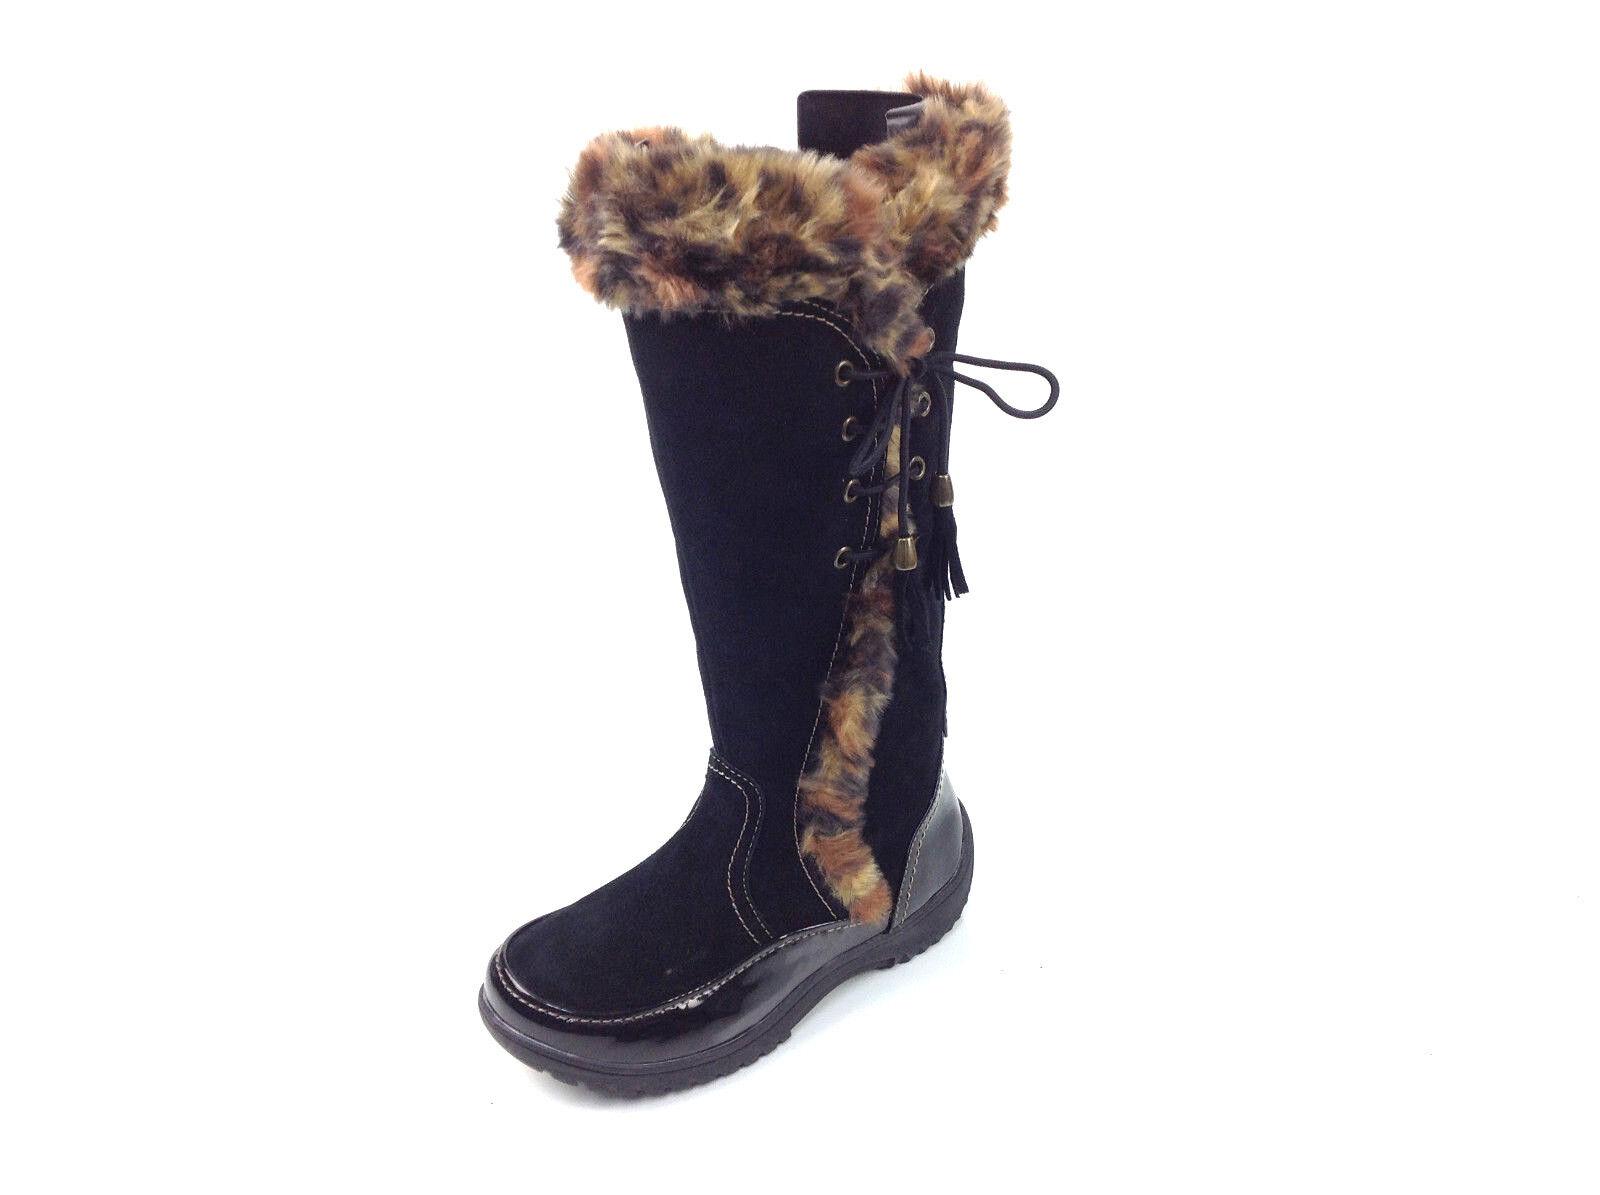 Sporto Waterproof Suede Tall Tall Tall Boot Side Winder Tassel Lace Up Black Leopard 8.5 W 3a6ad8